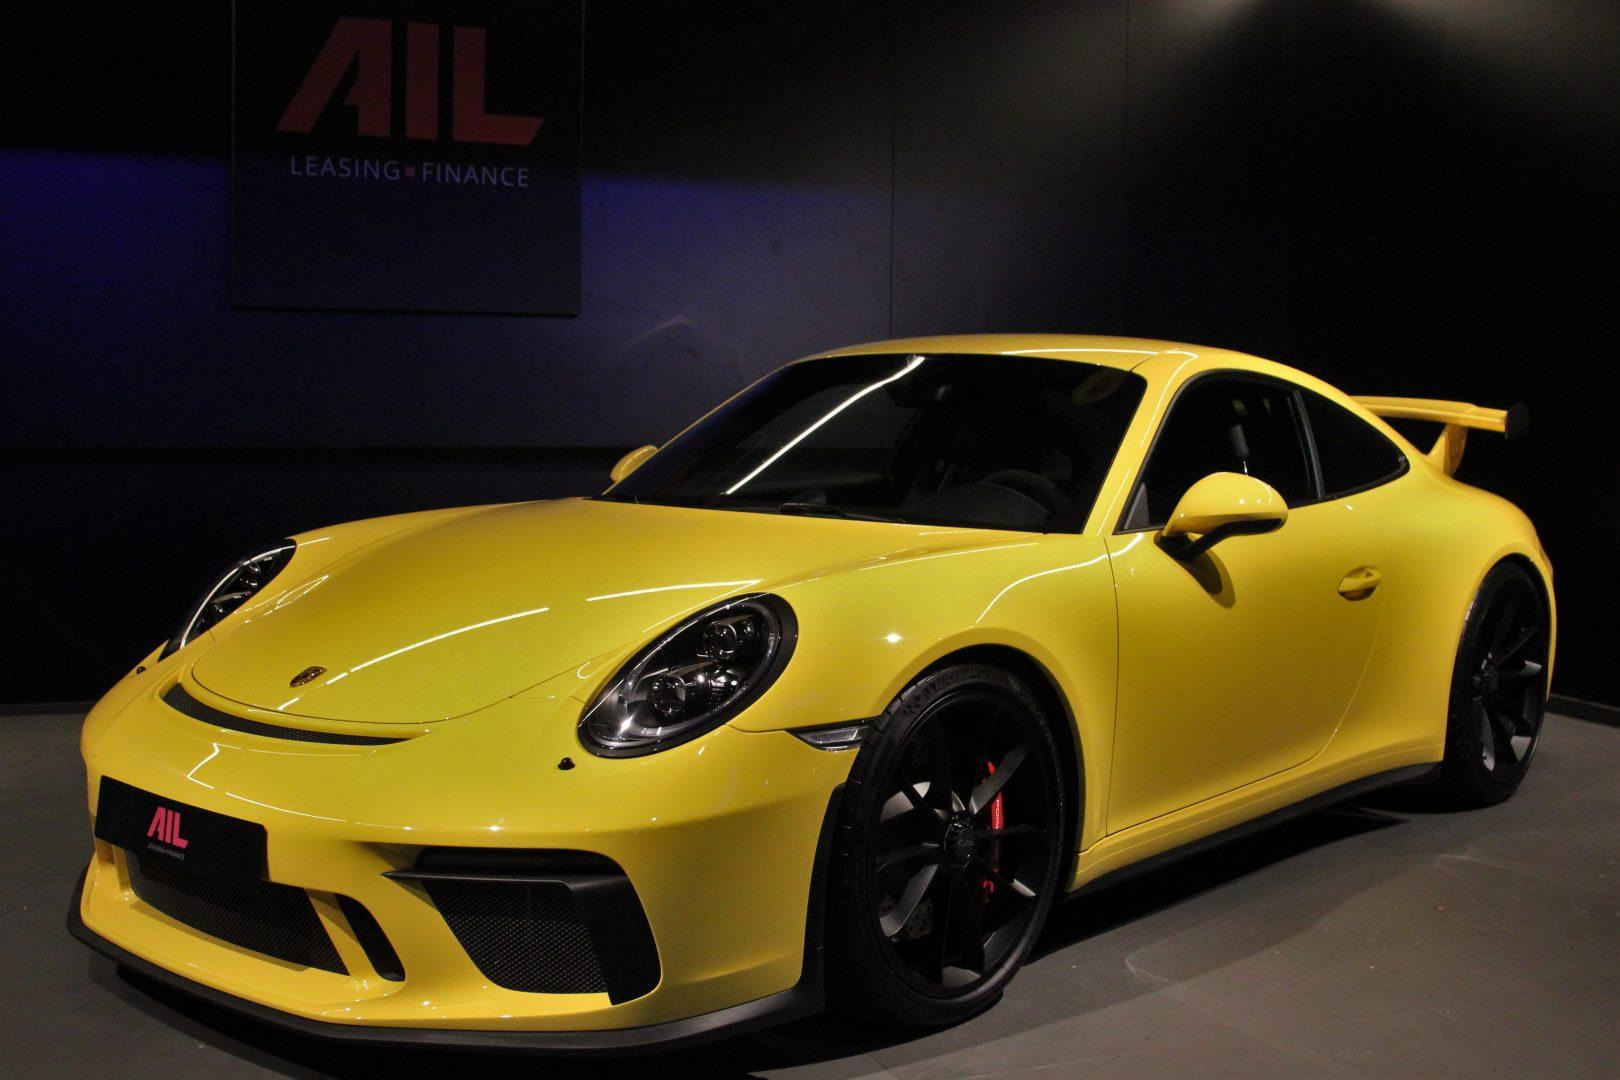 AIL Porsche 911 991 GT3 Clubsport-Paket LED Lift  13